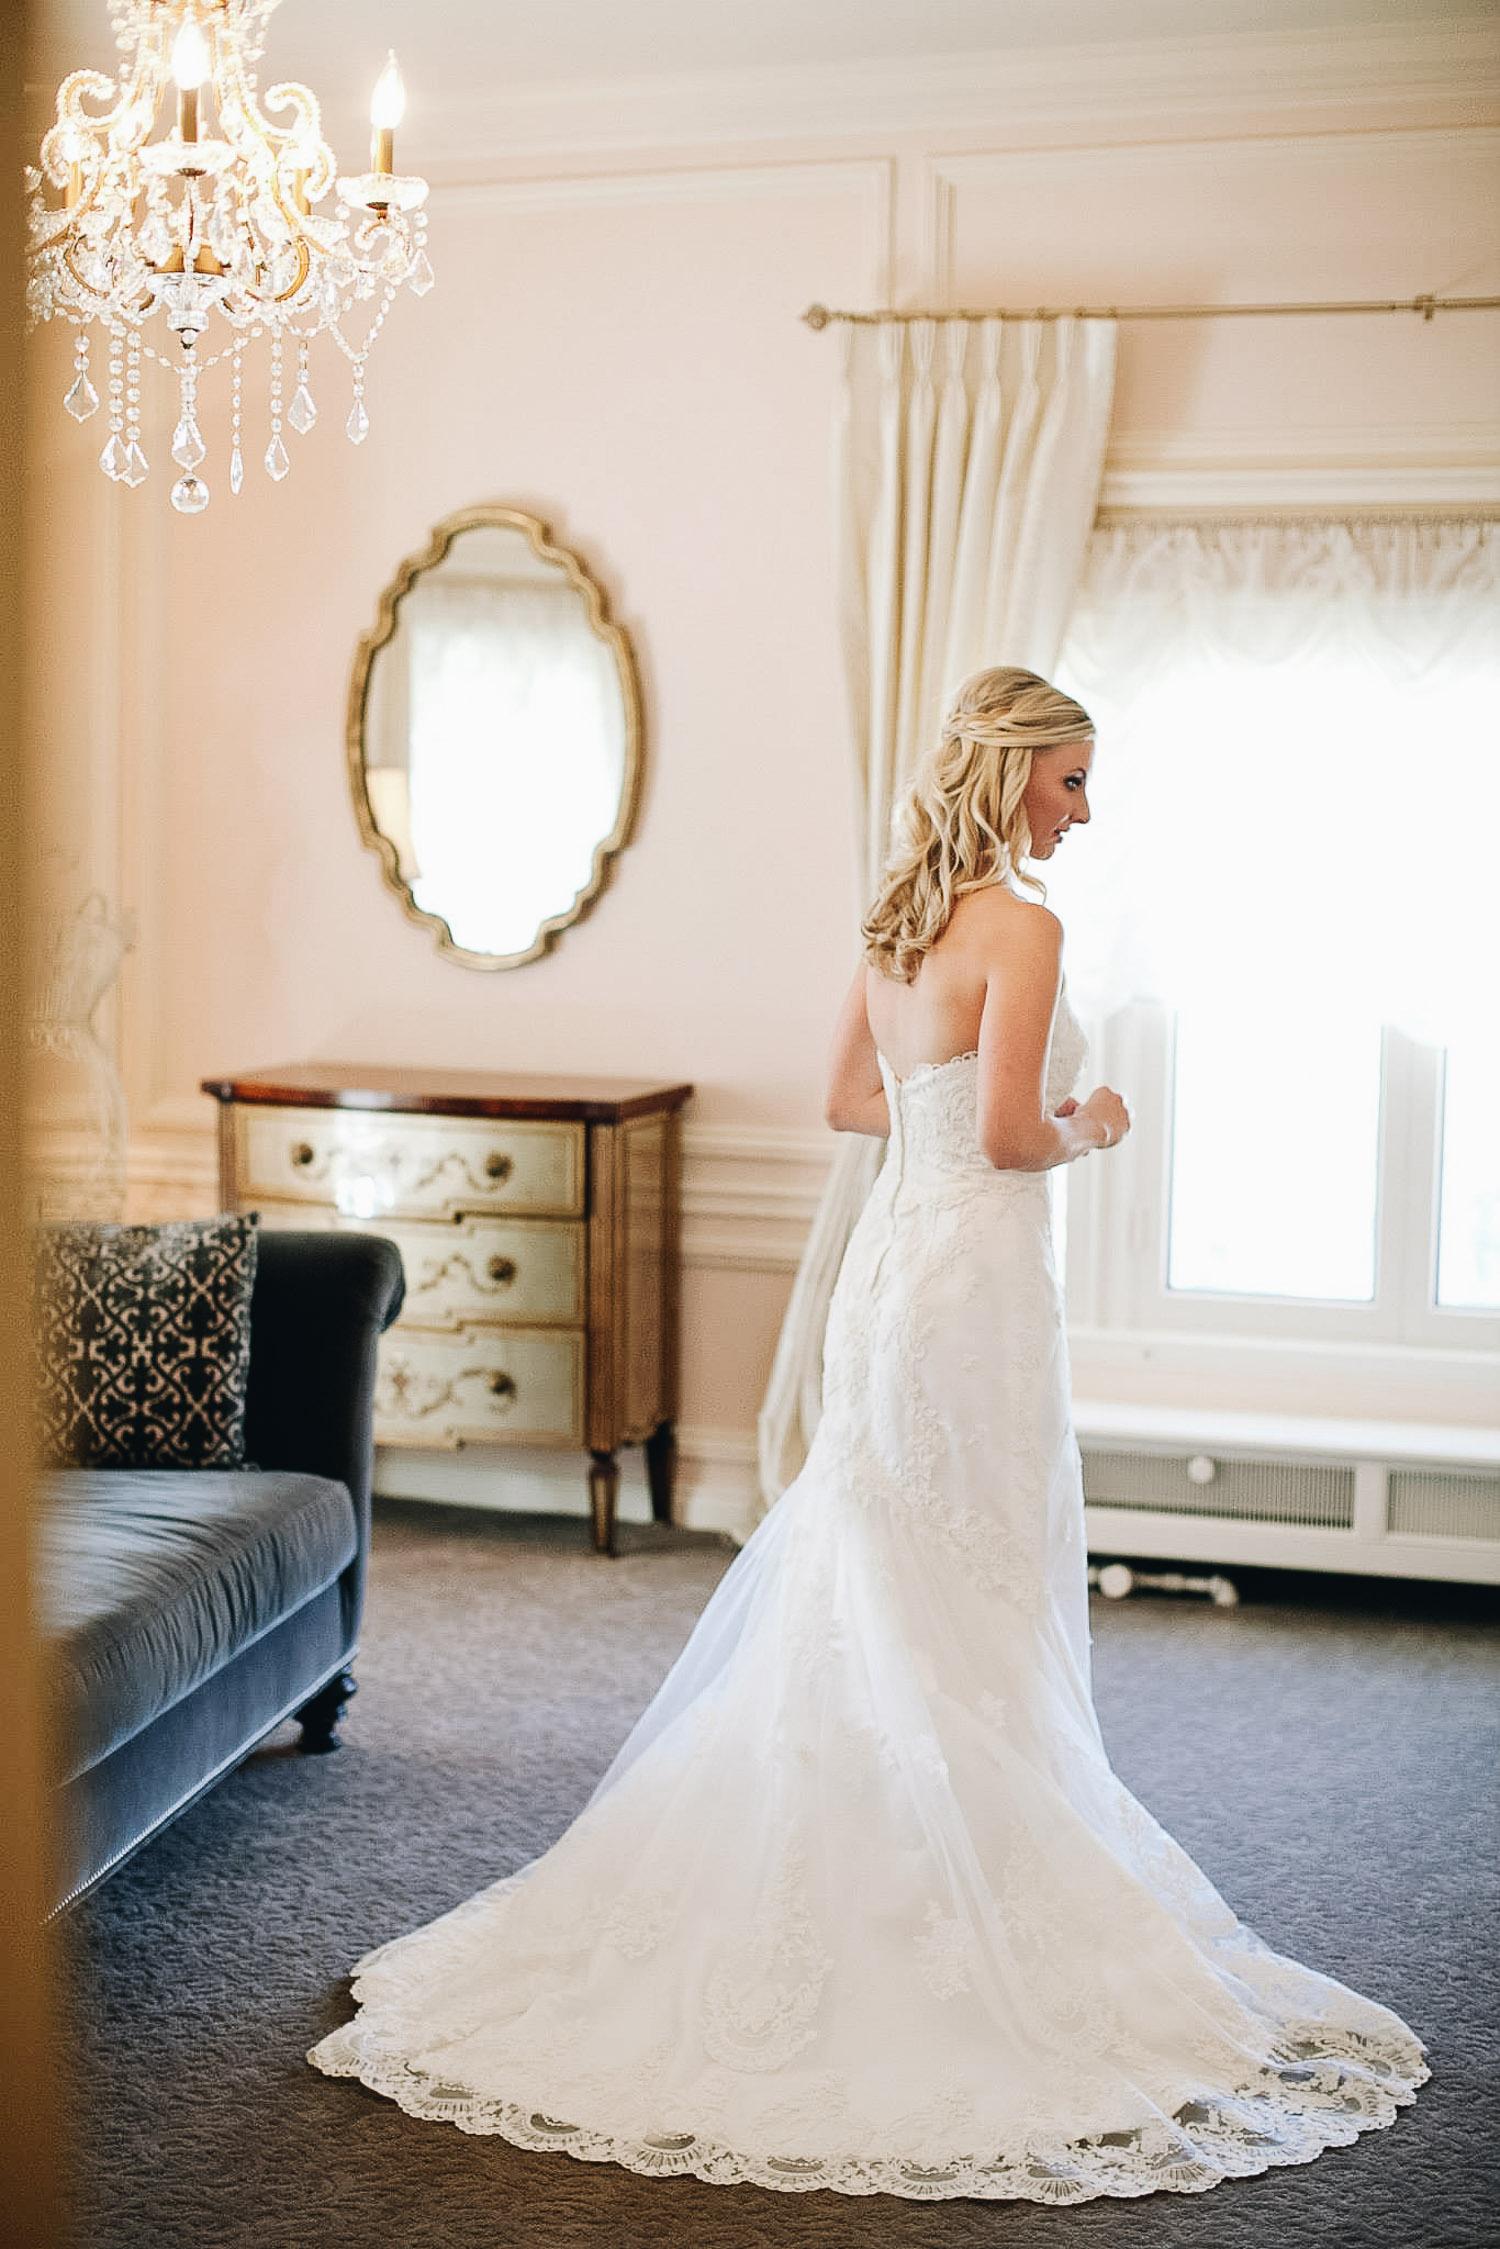 JMPHOTOART-Wedding-Photographer-120.jpg